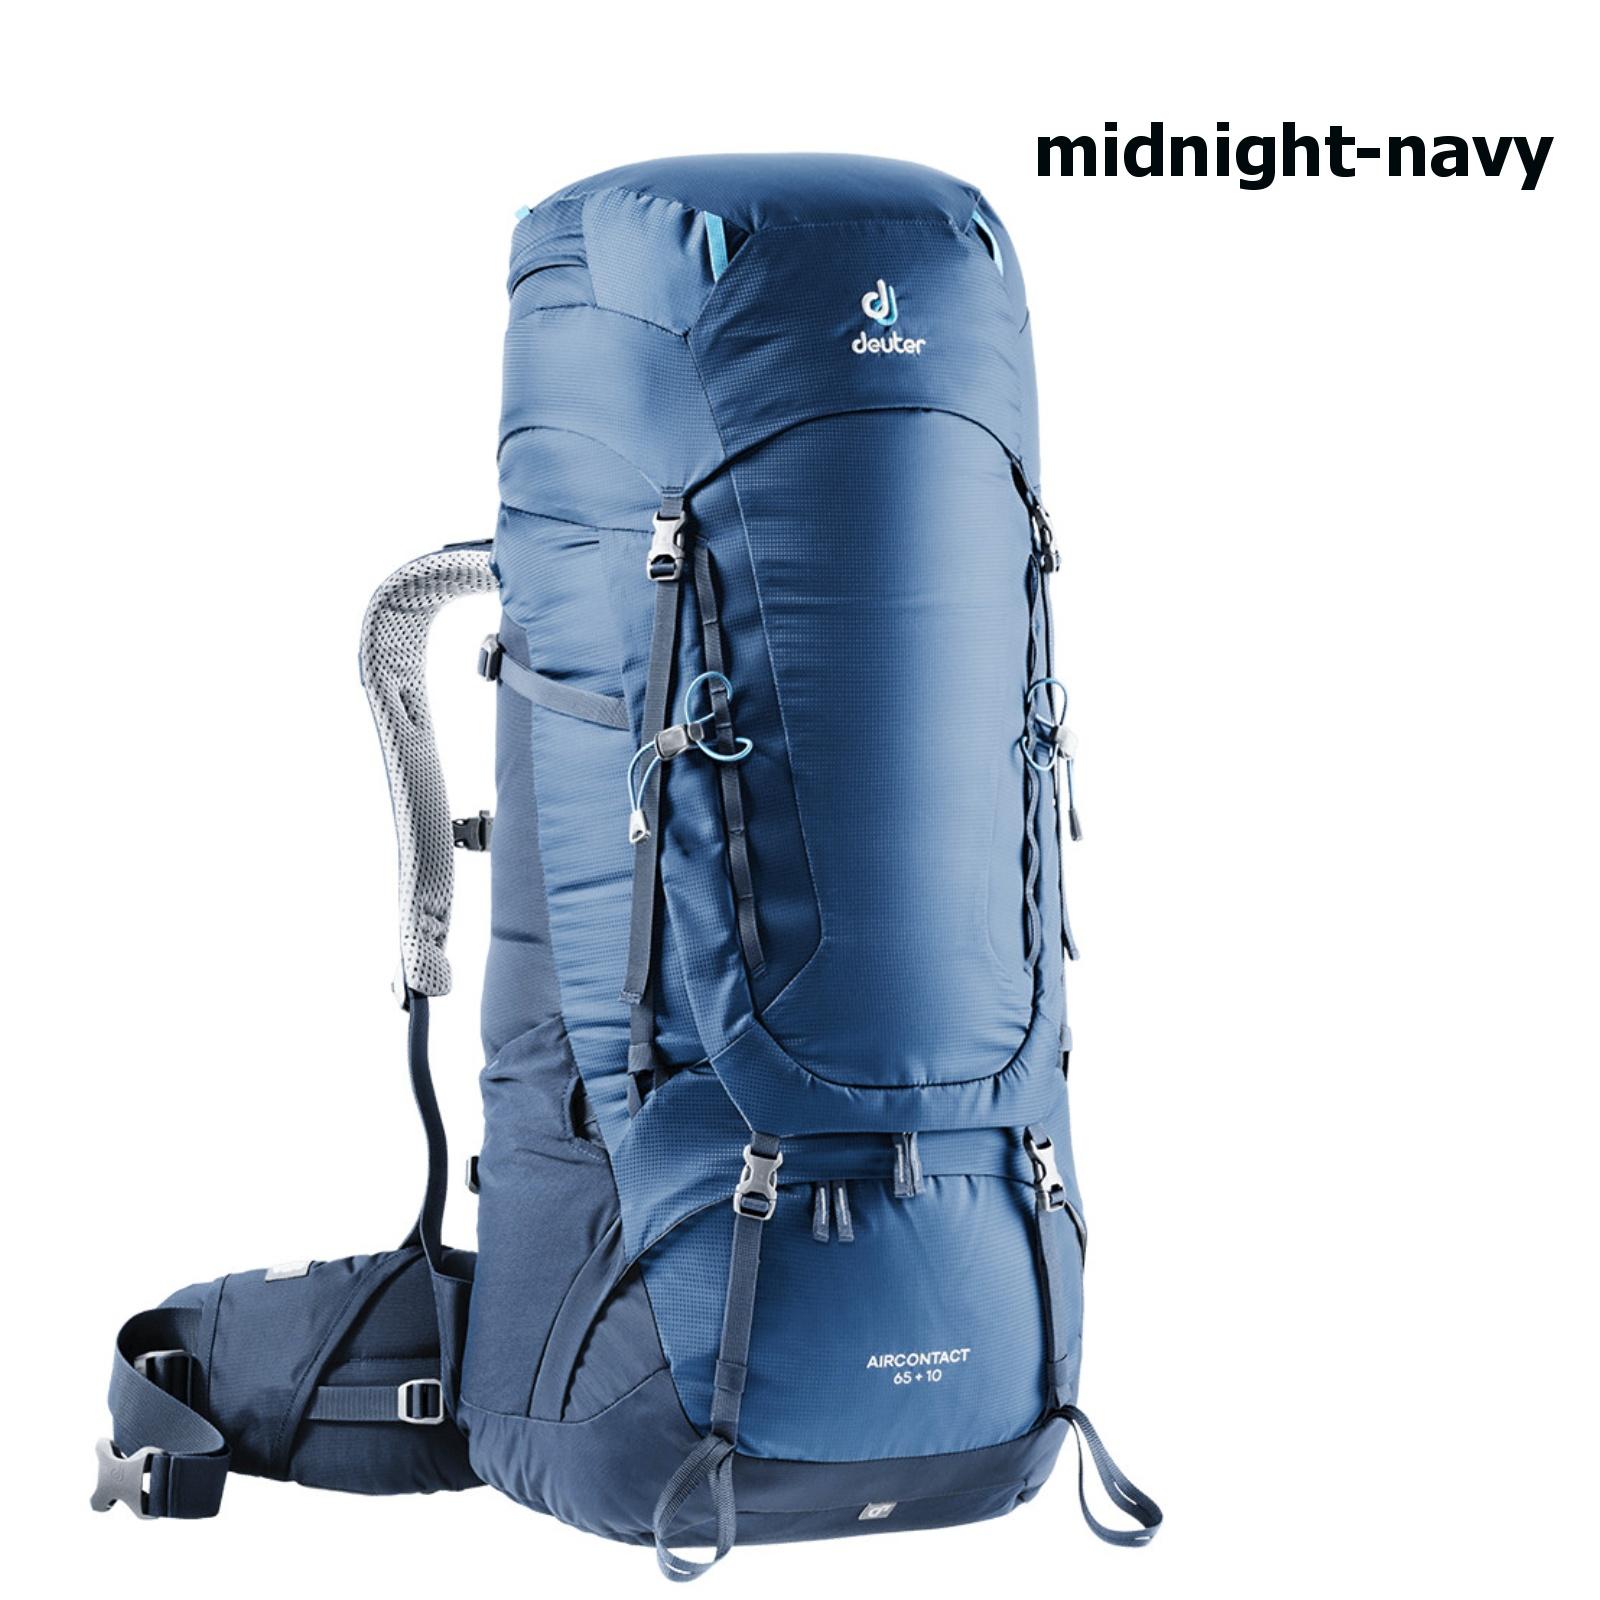 Deuter Aircontact 65 + 10 Midnight navy